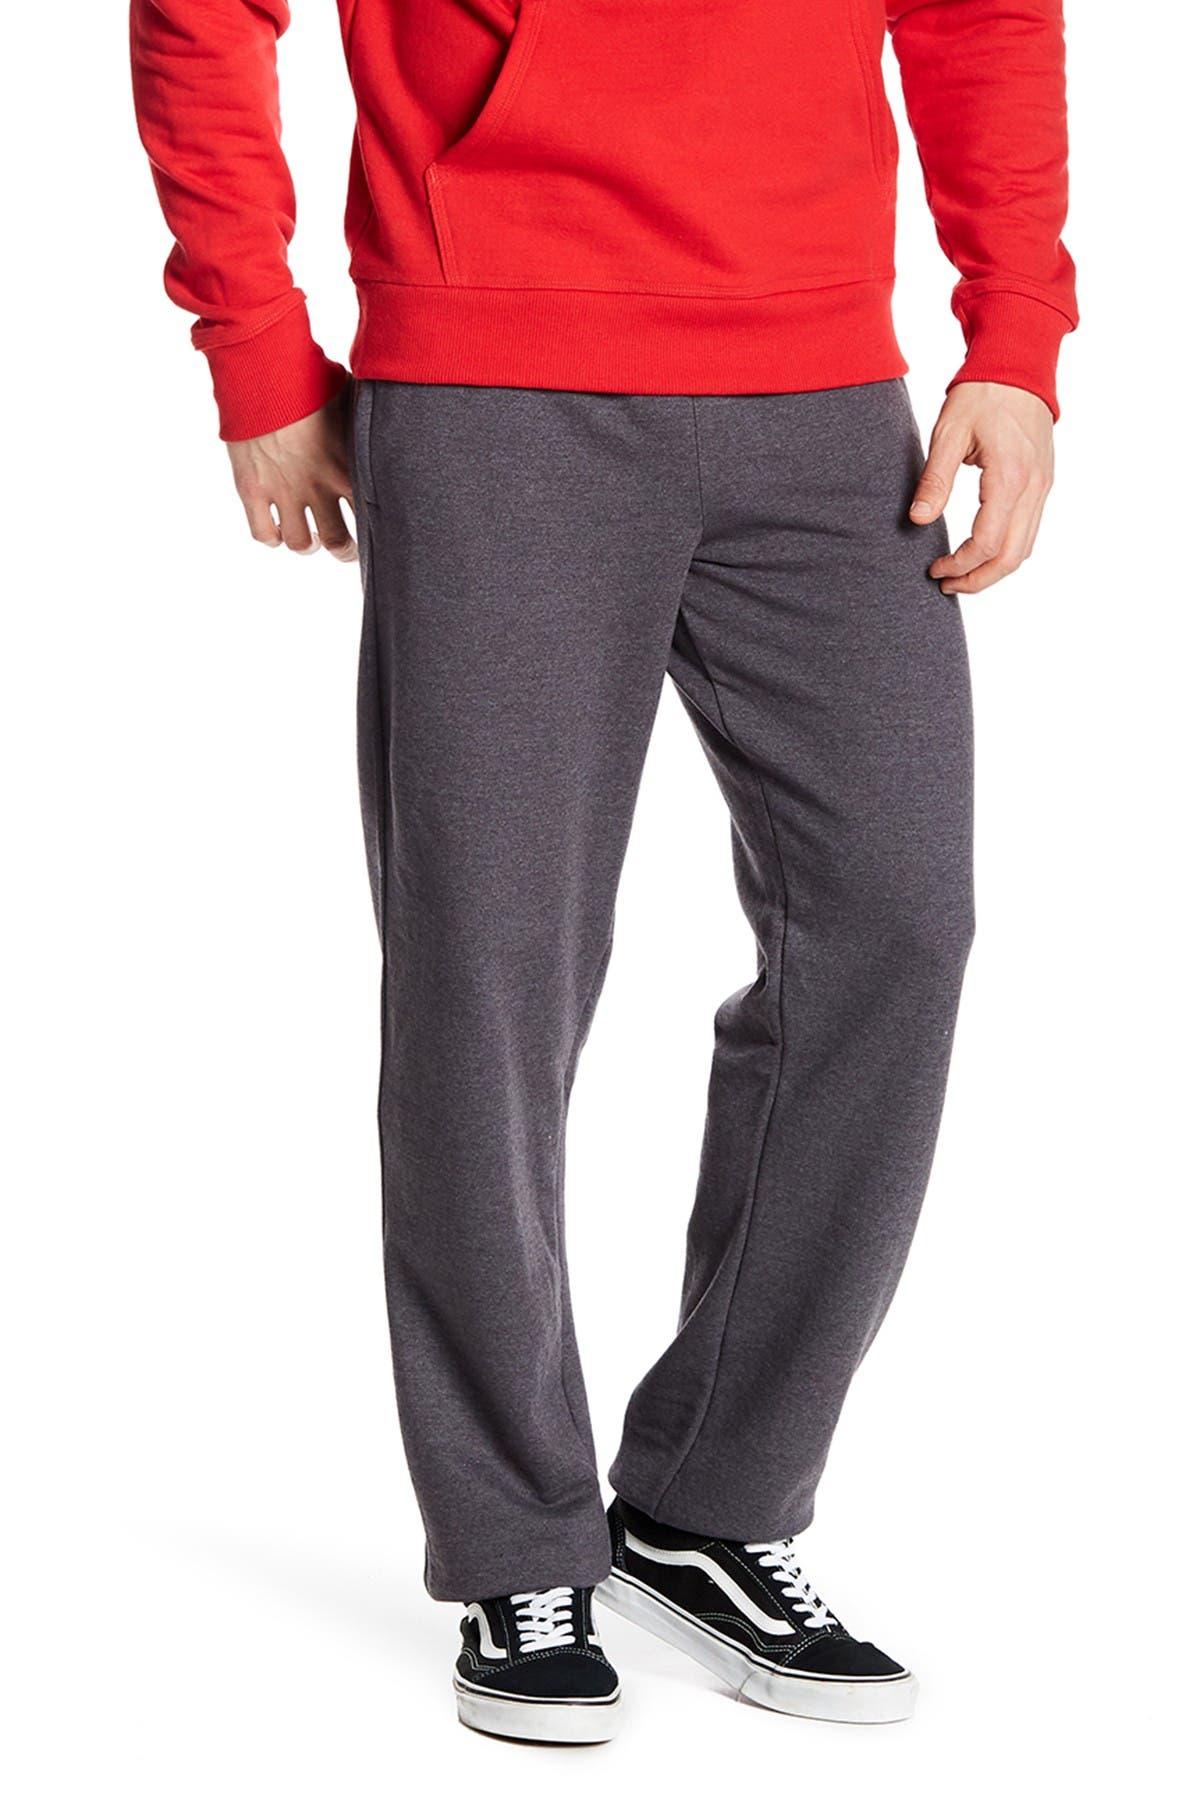 Image of Champion Fleece Drawstring Logo Sweatpants